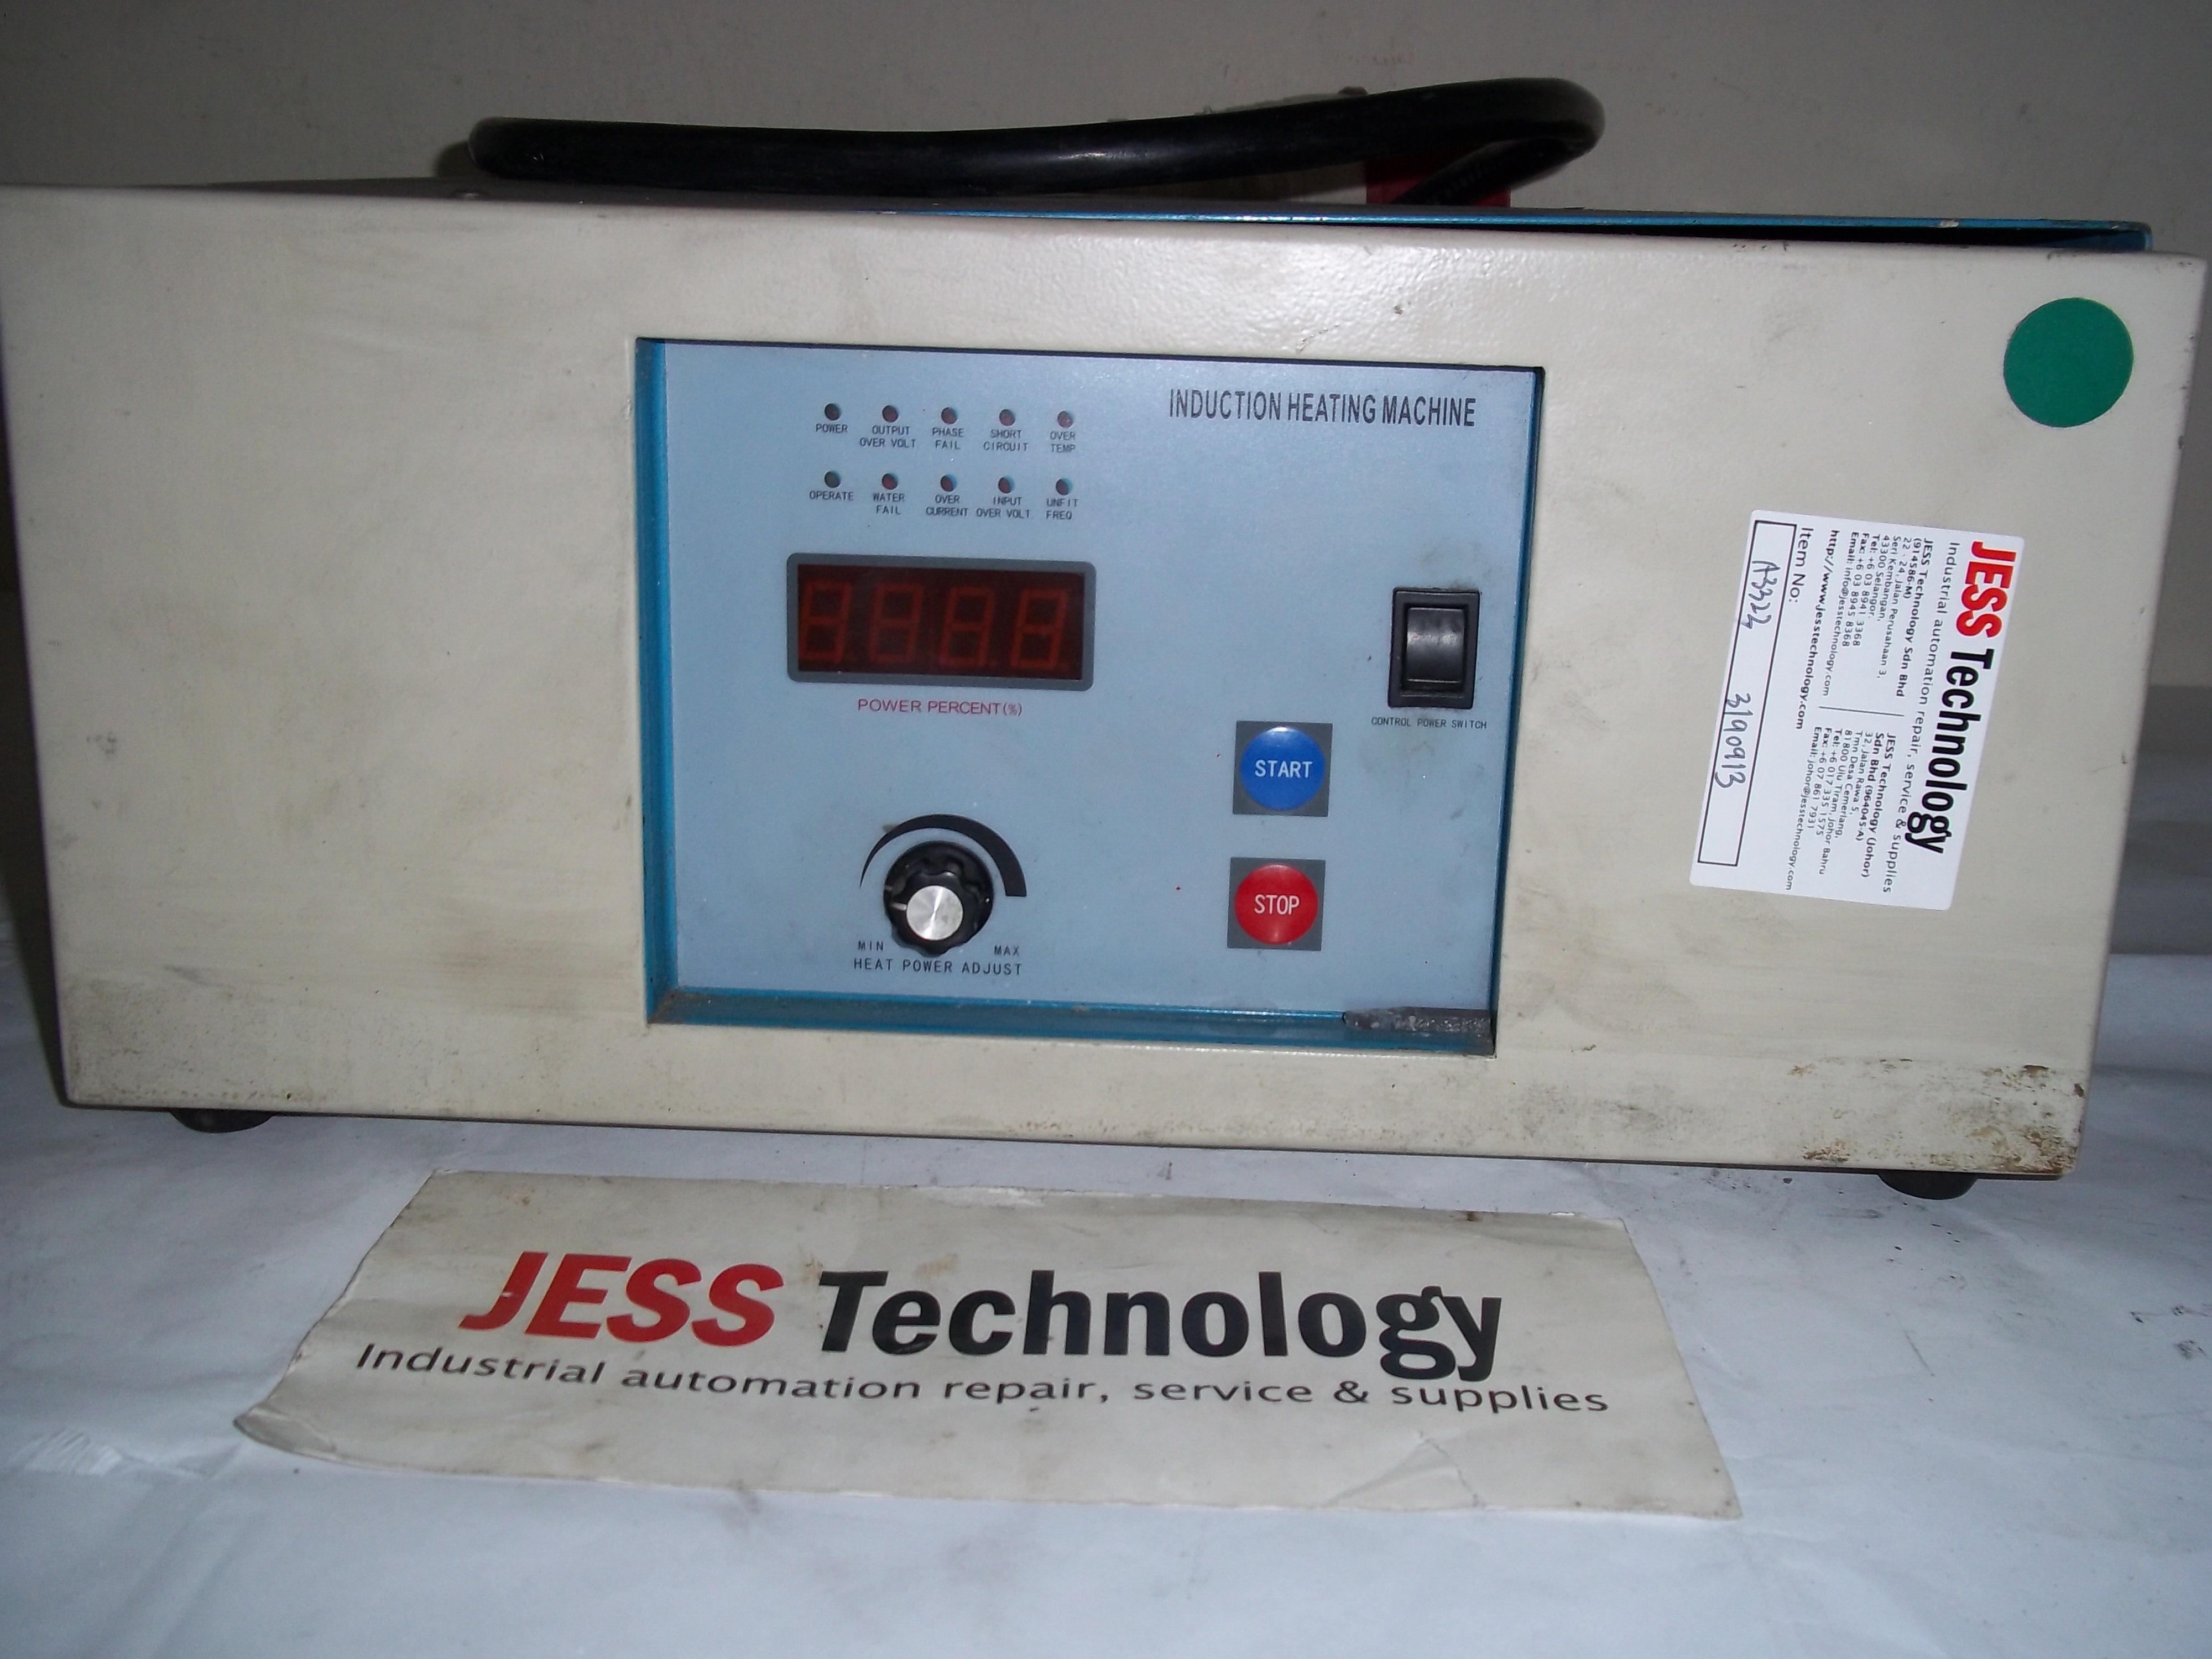 Repair G7231 TOSHIBA INDUCTION HEATING MACHINE in Malaysia, Singapore, Thailand, Indonesia